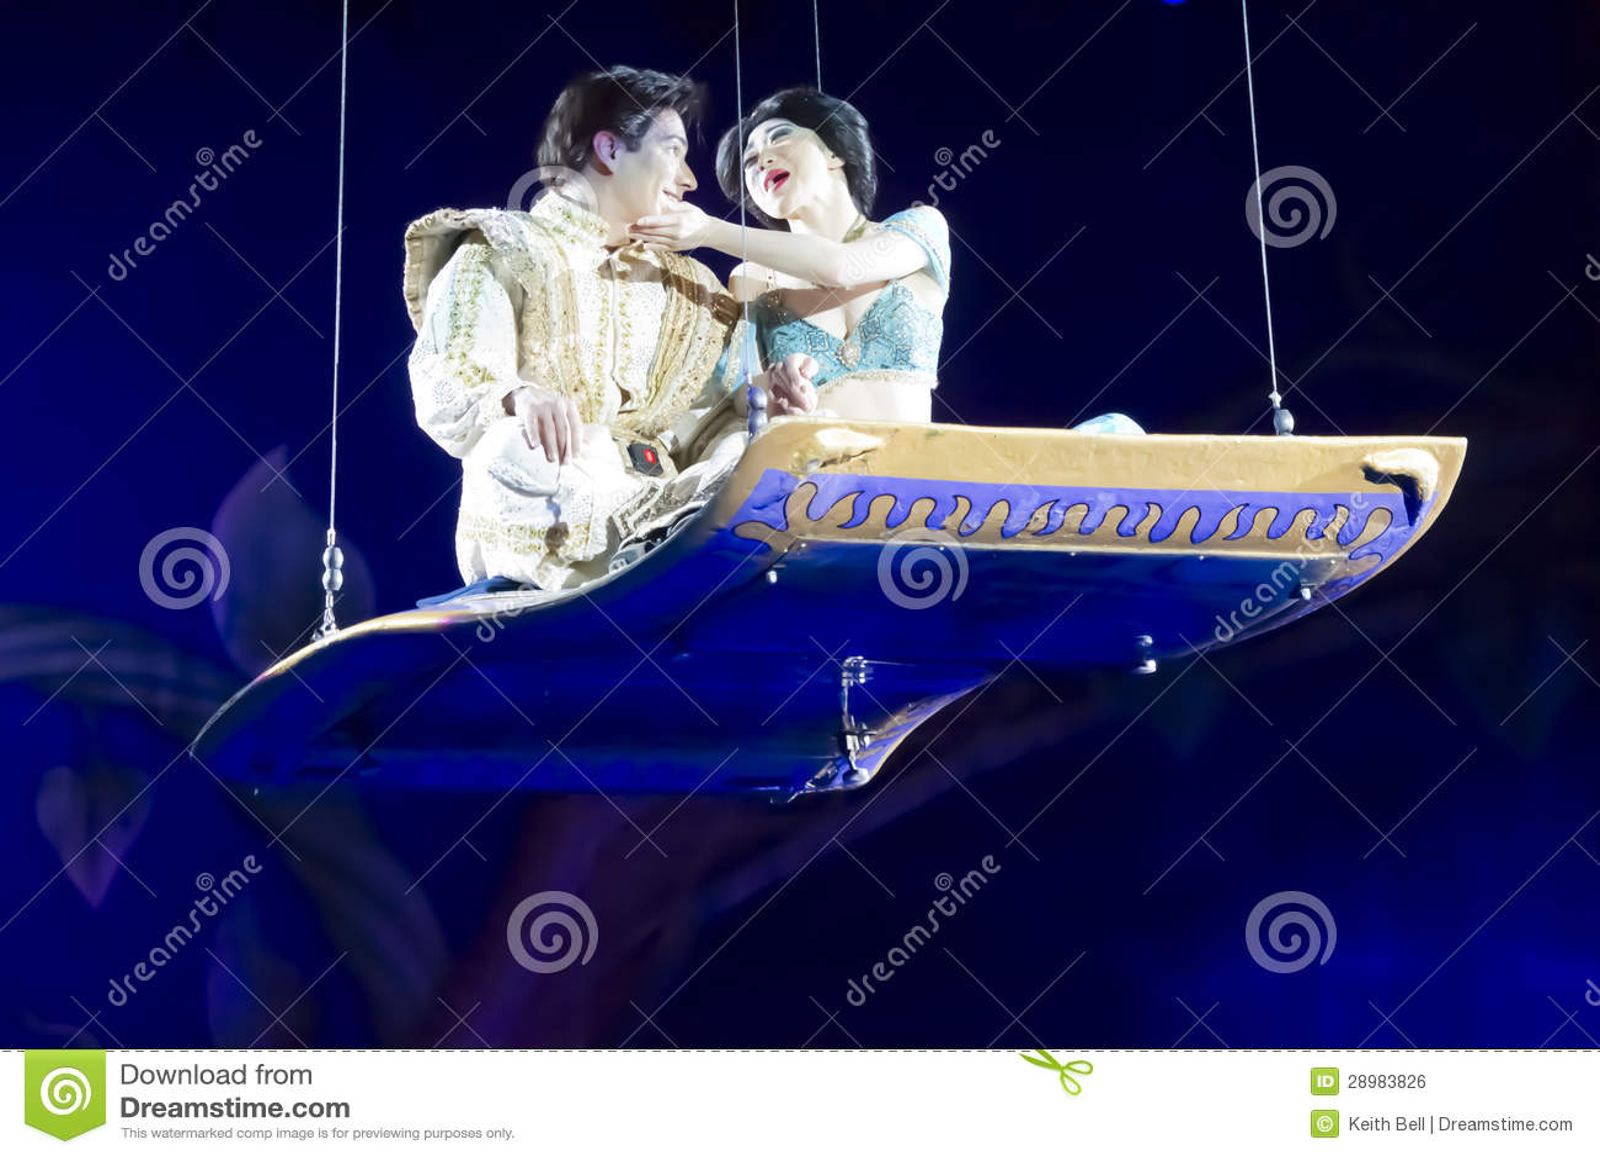 Aladdin And Jasmine On The Magic Carpet Embrace Editorial ...